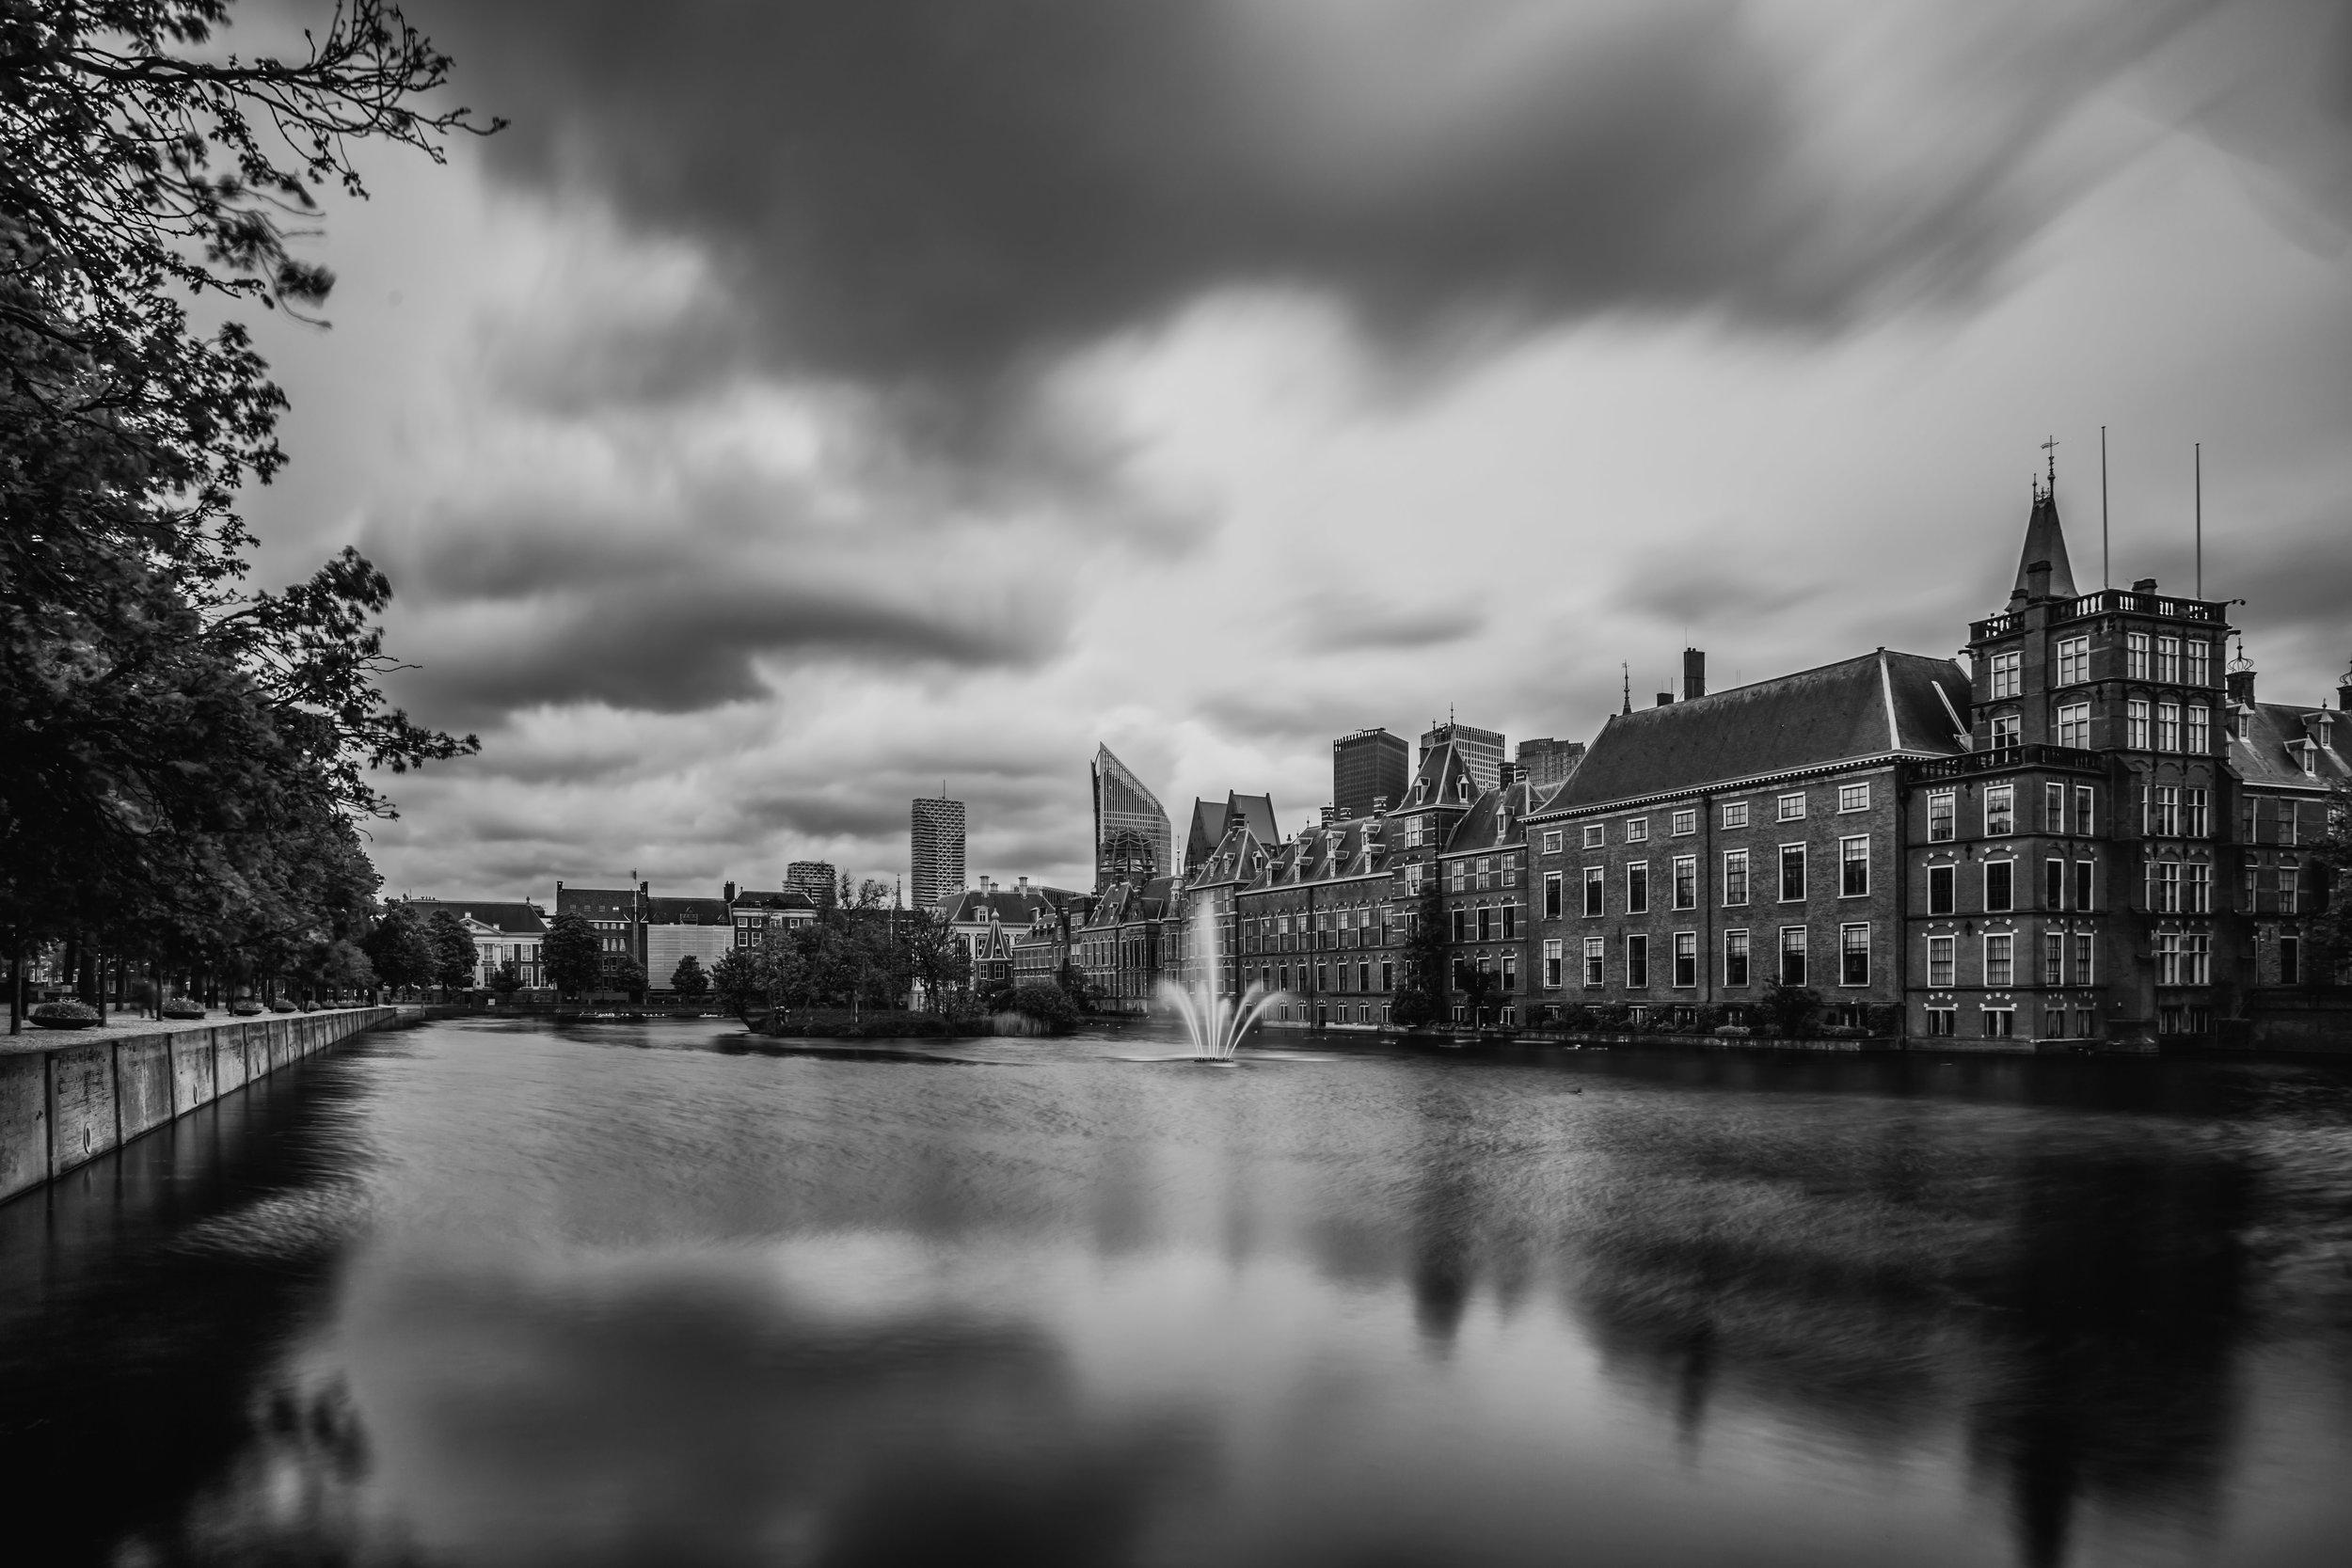 The Hague, Buitenhof (Black and White)